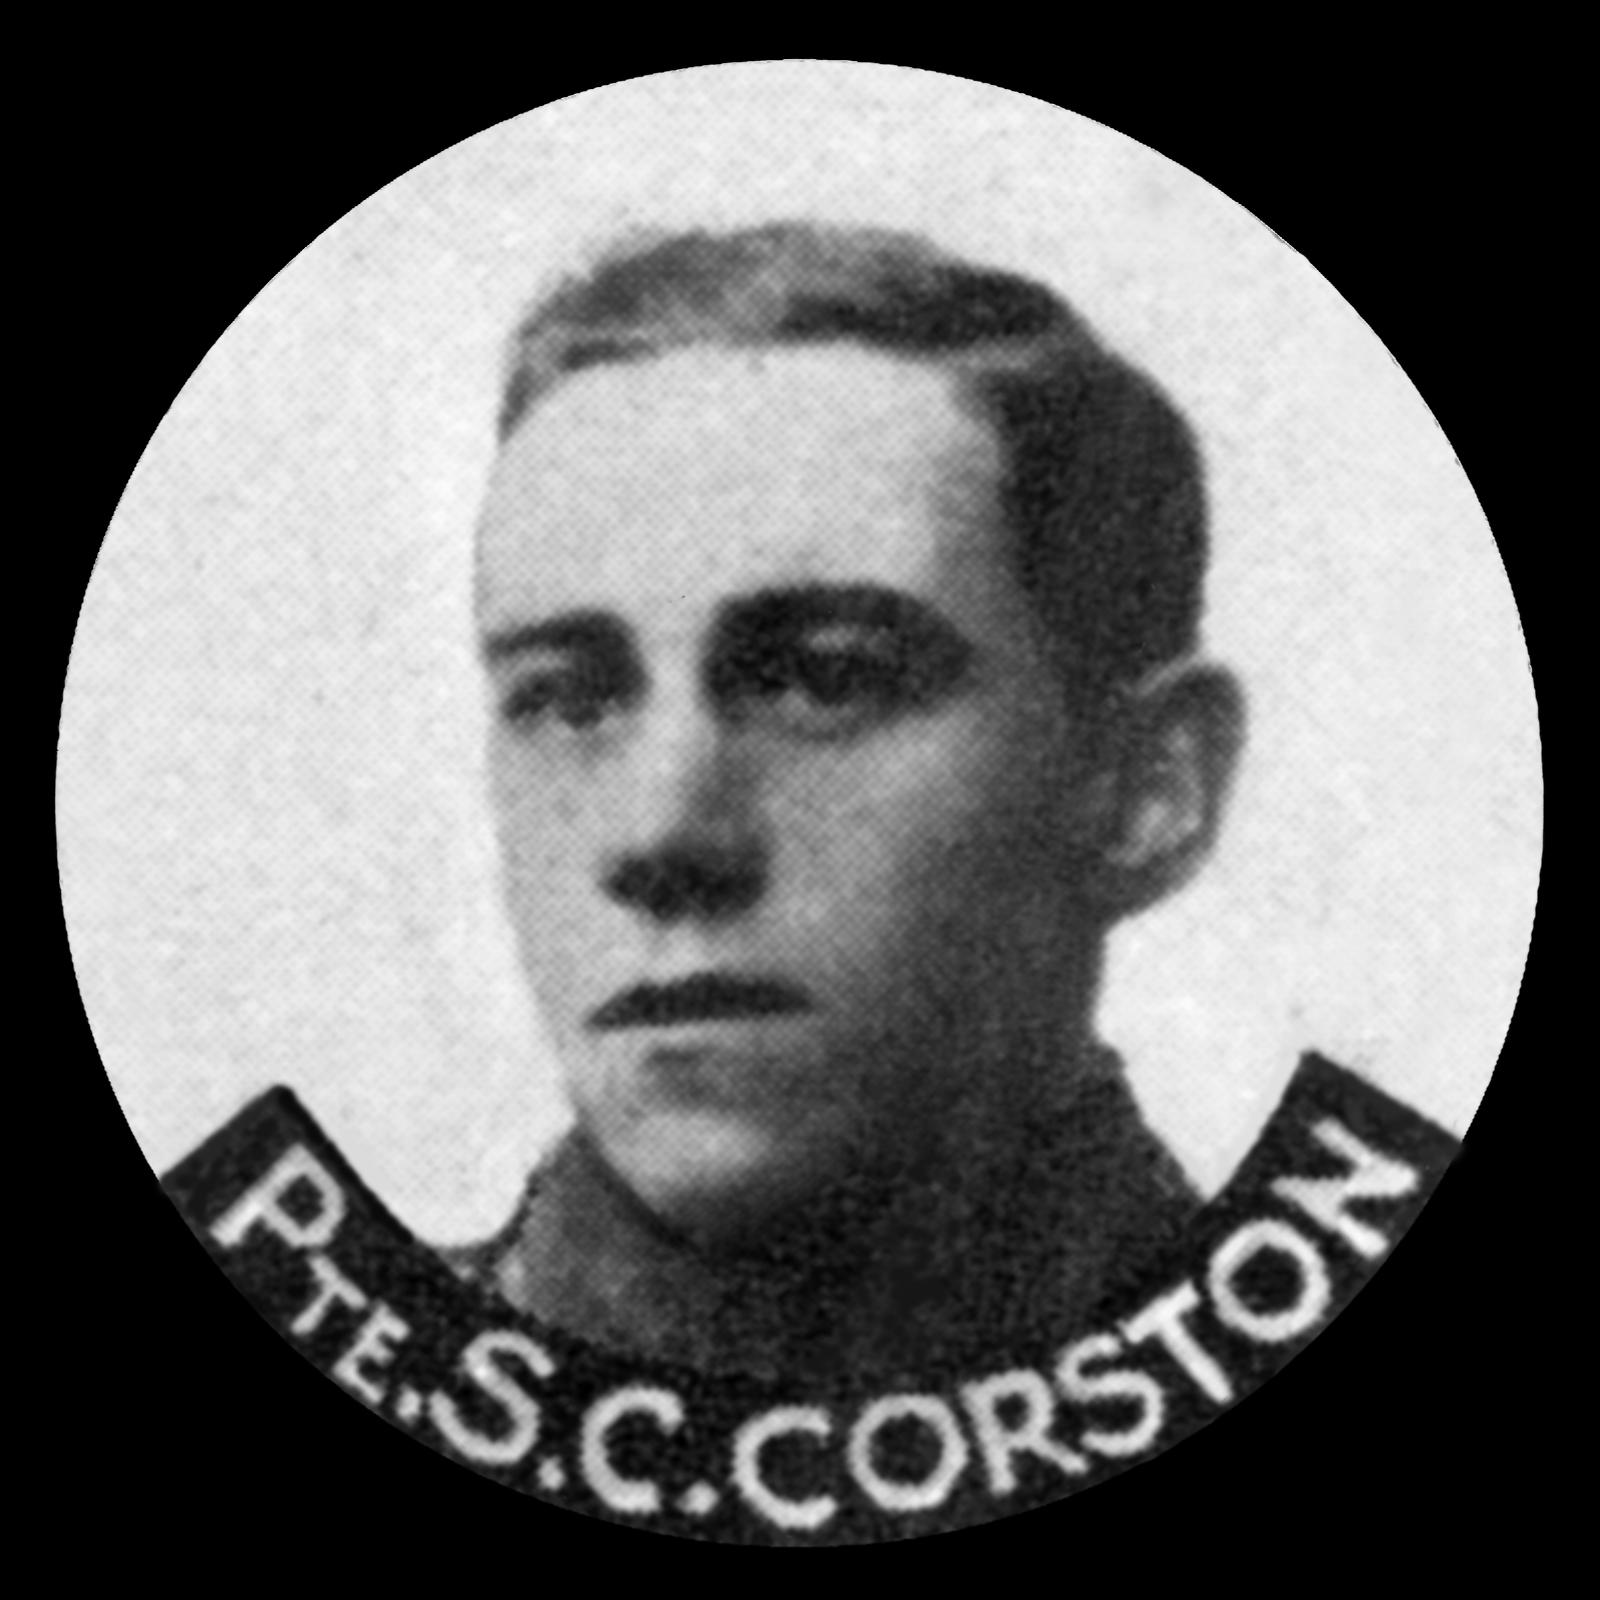 CORSTON Sidney Charles